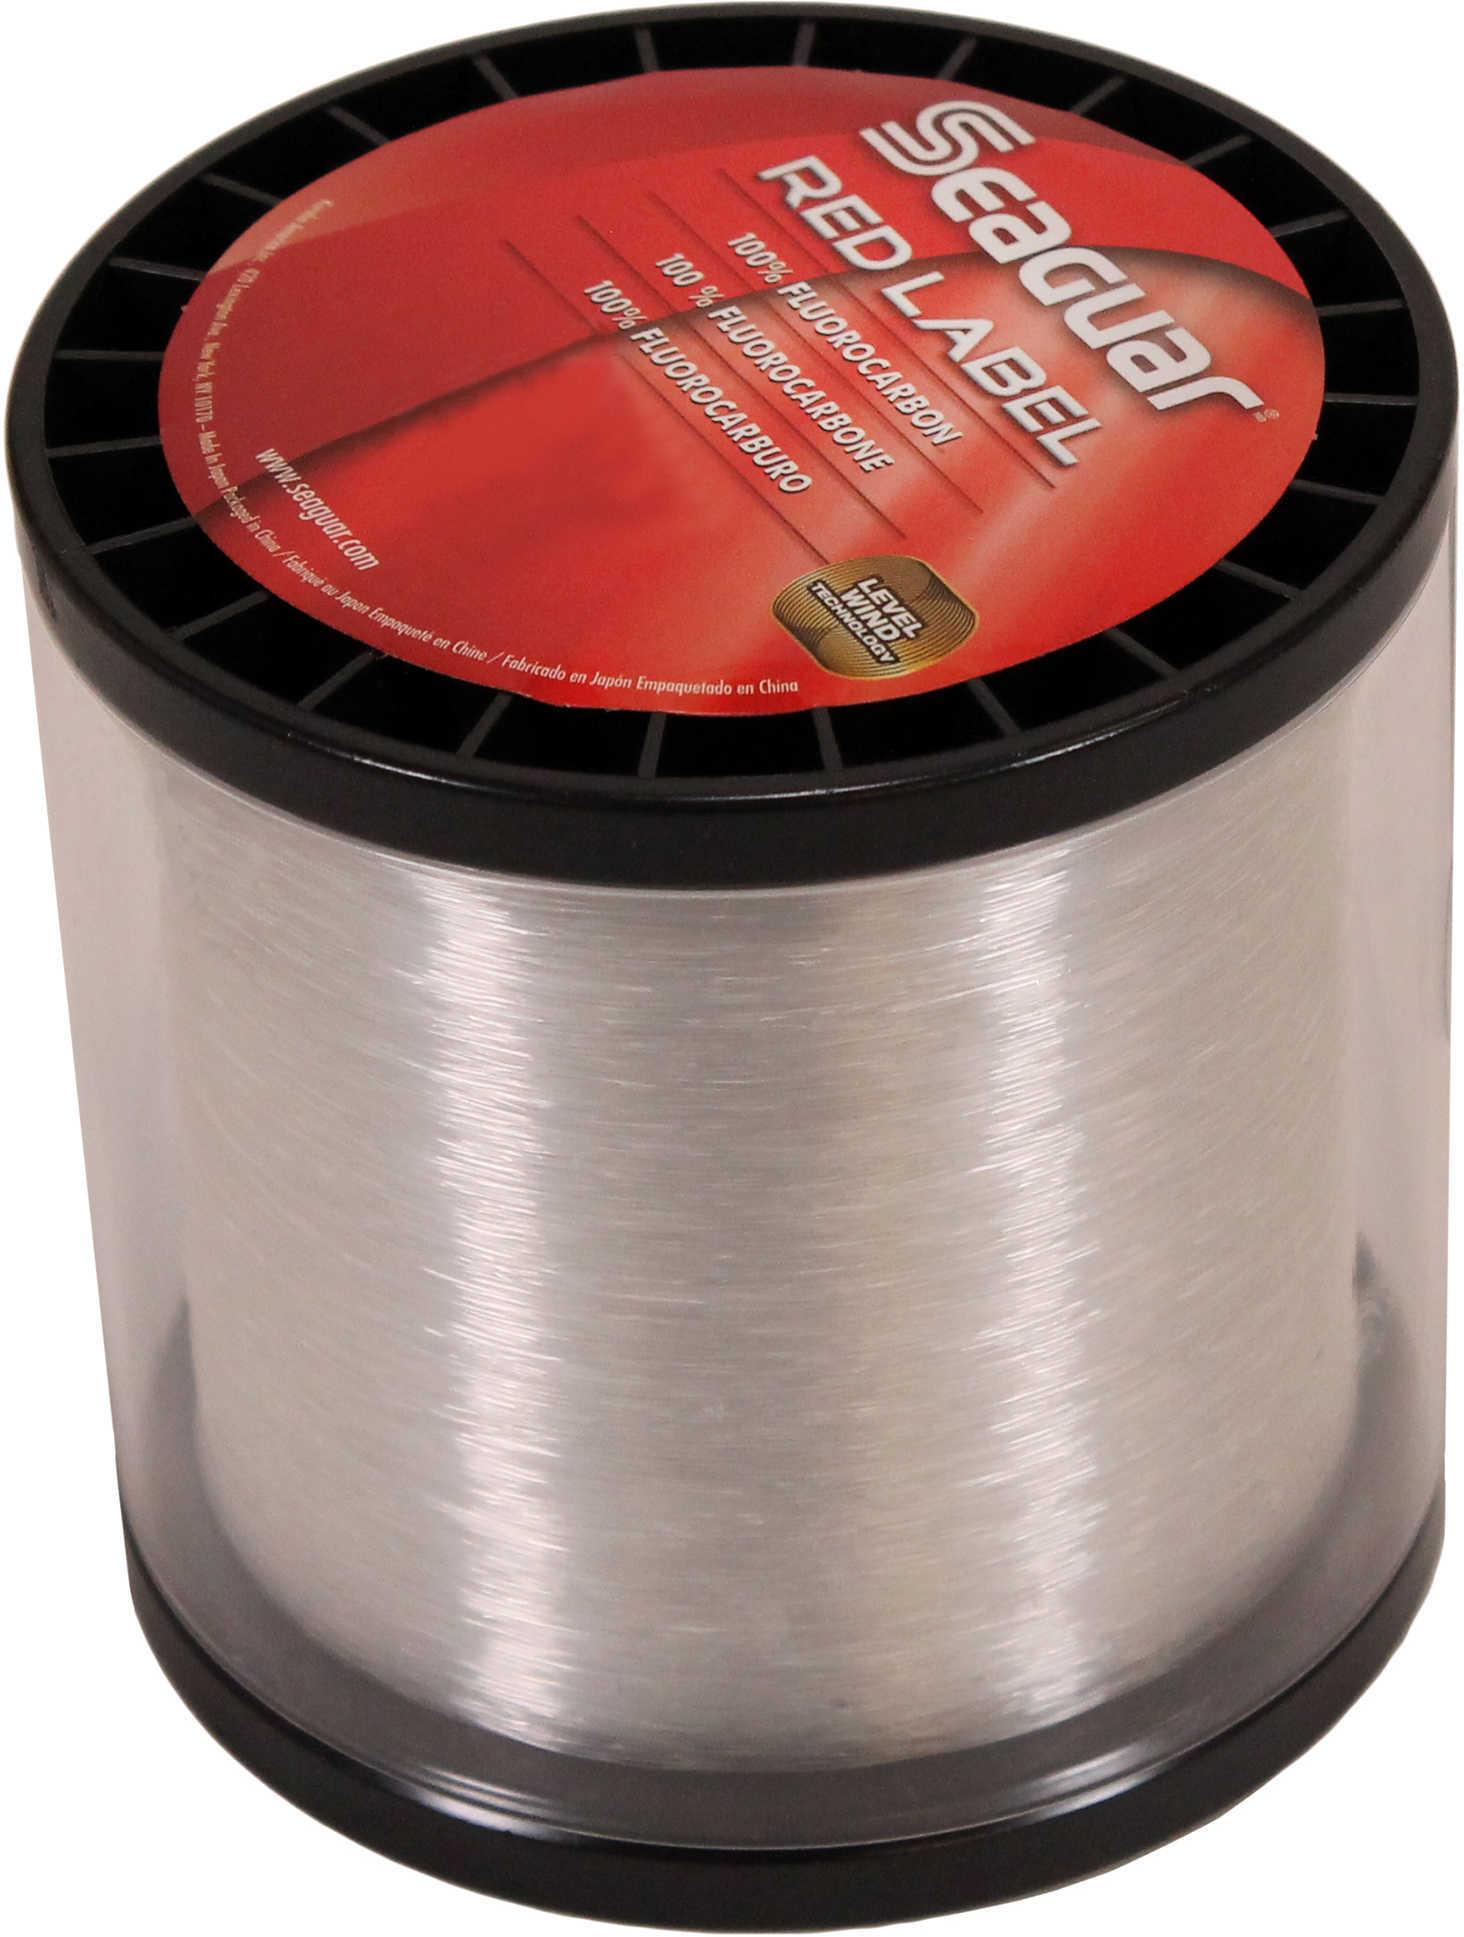 Seaguar Red Label 100% Fluorocarbon 1000Yd 10Lb 10Rm1000